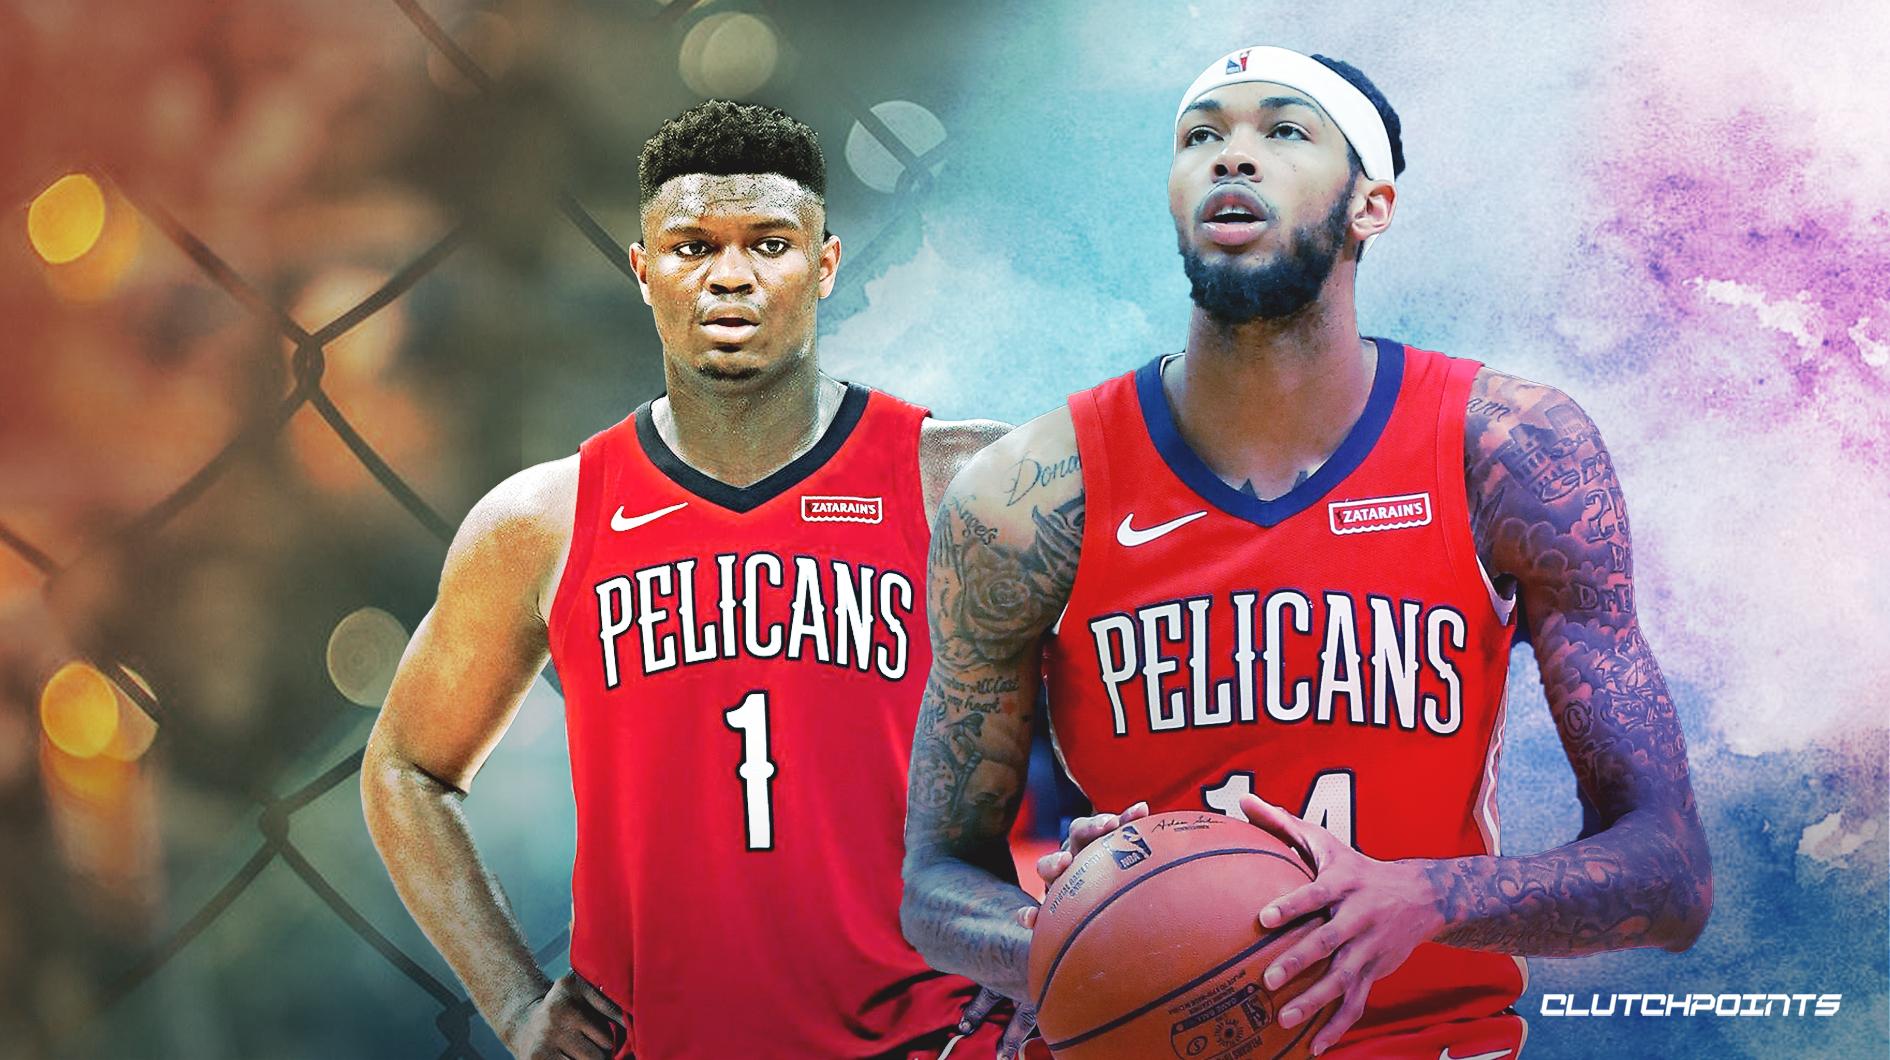 Nba Season Preview Iv New Orleans Pelicans New York Knicks Oklahoma City Thunder Orlando Magic Philadelphia Sixers And Phoenix Suns Bbspecialtips Com